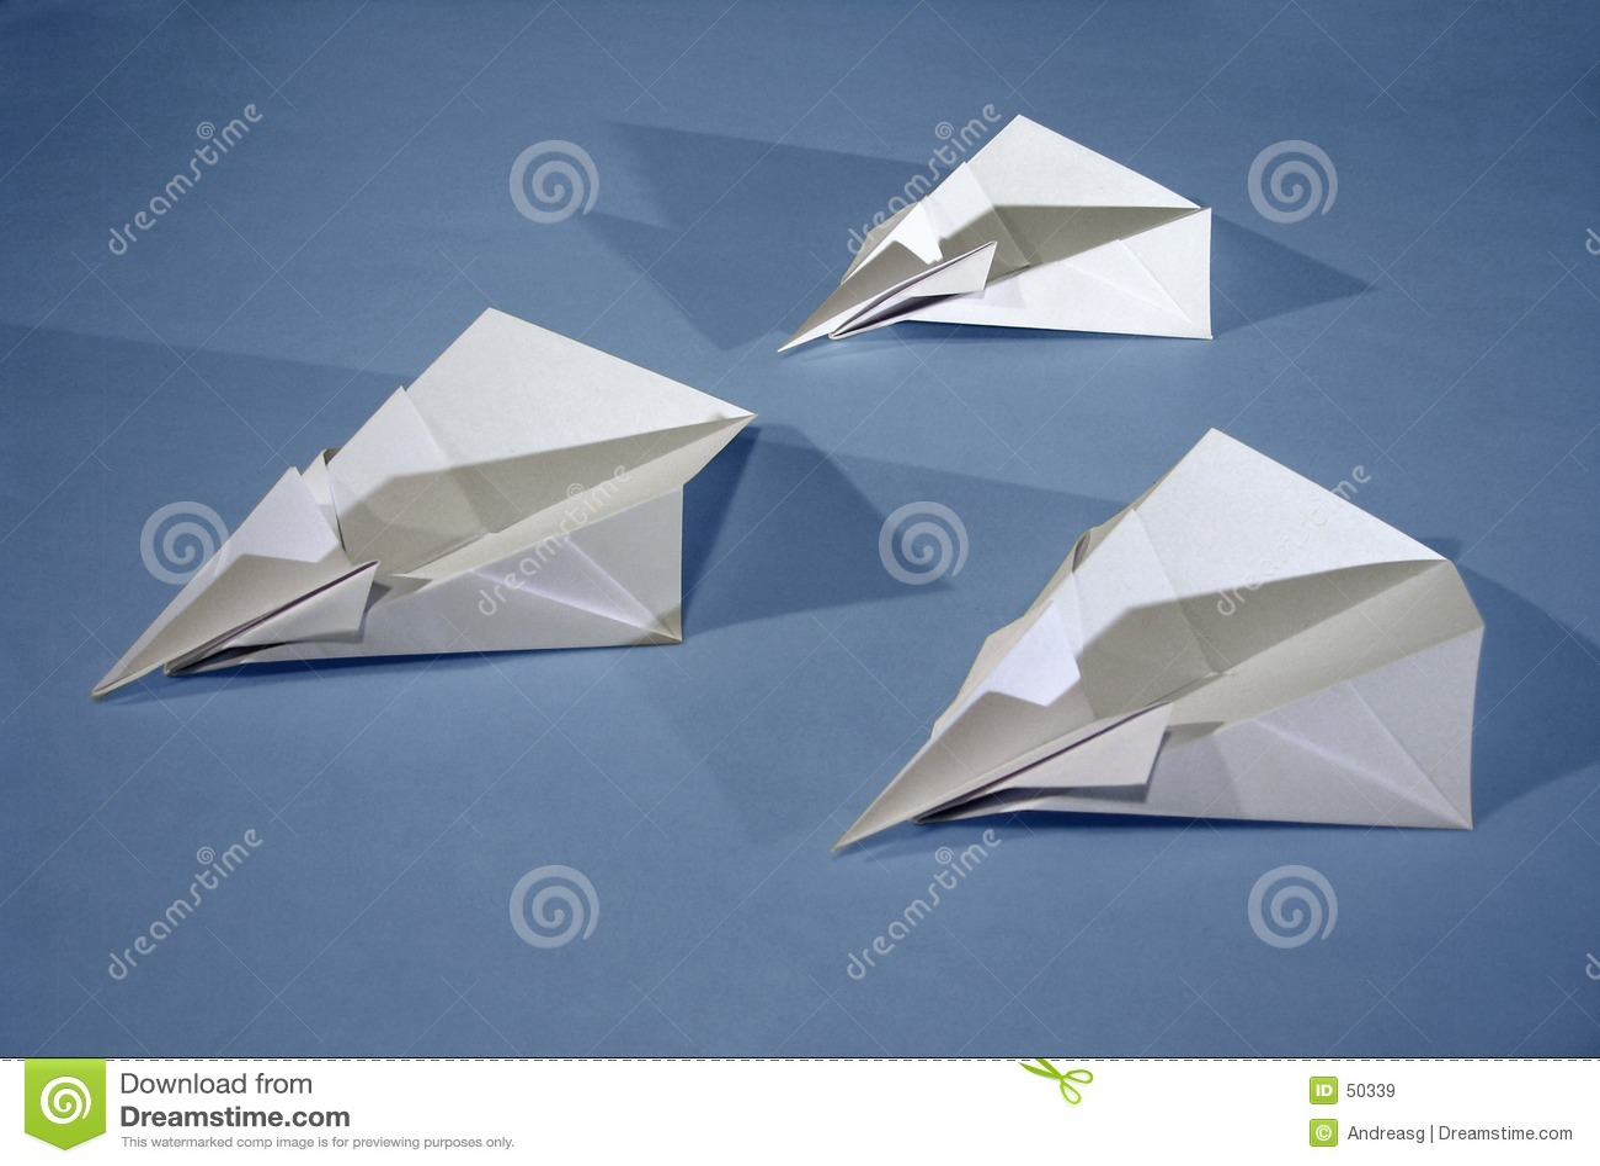 3 aviones de papel